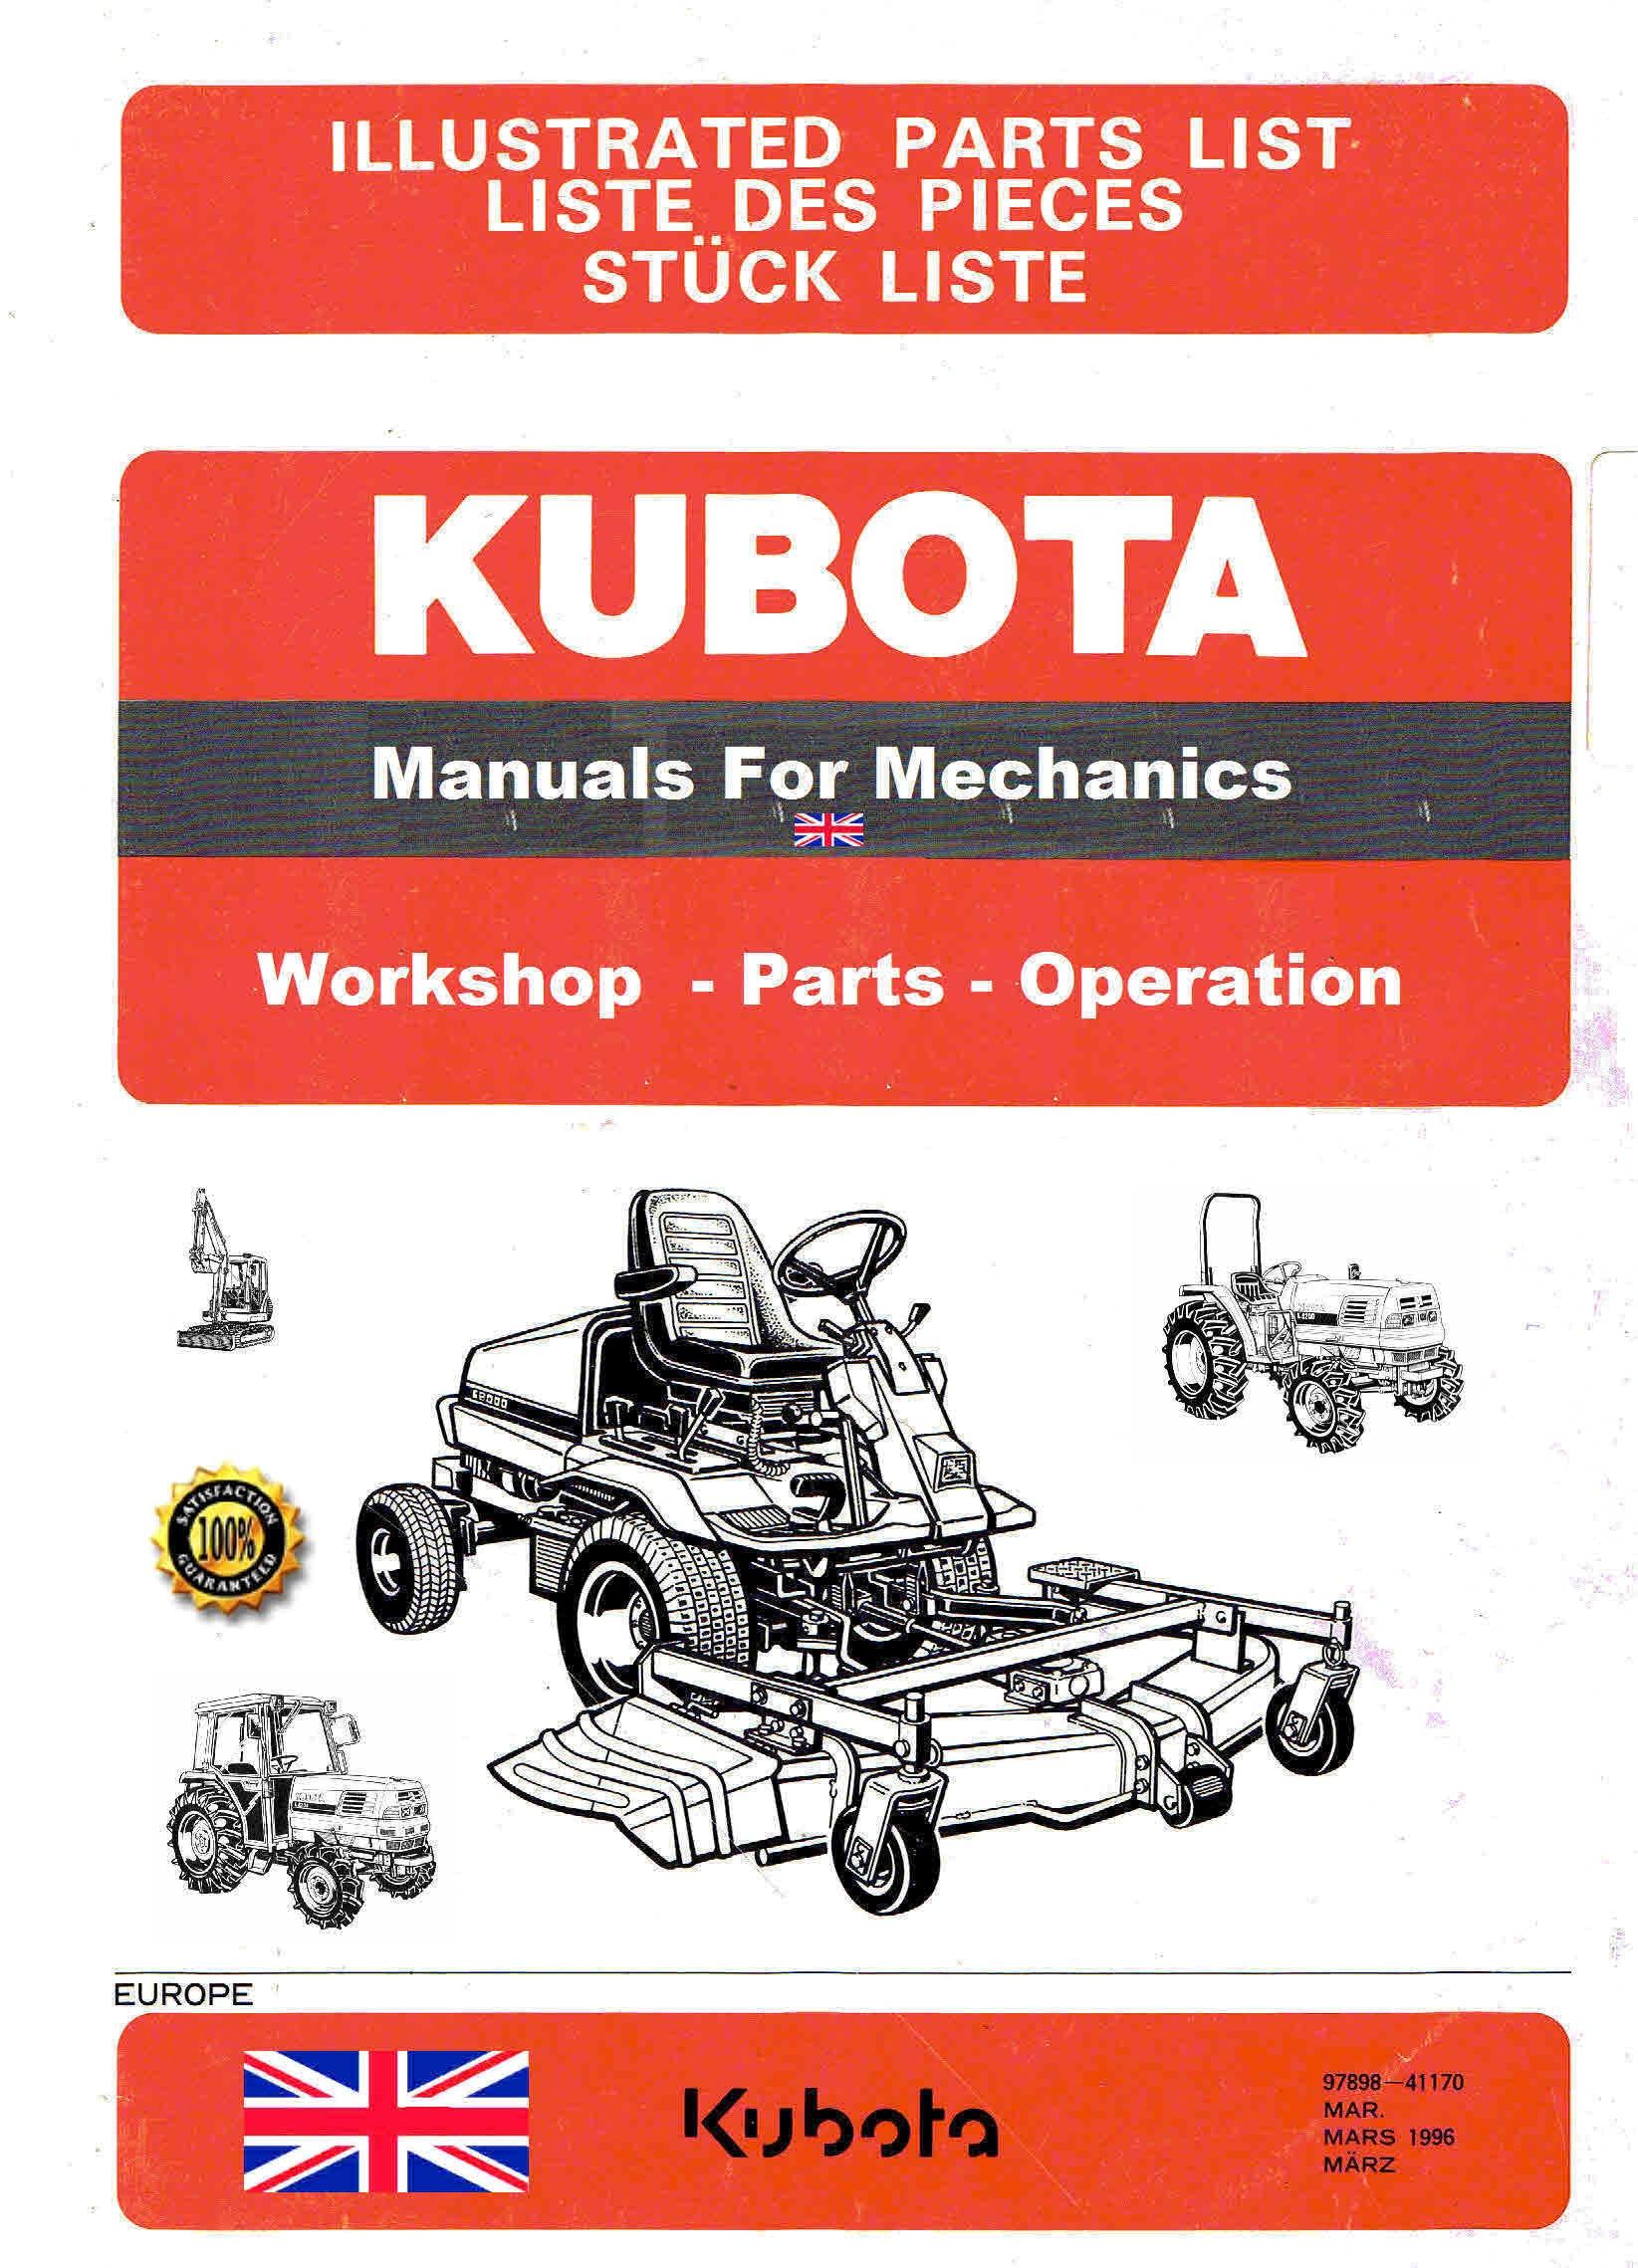 kubota manuals for mechanics themanualman rh sellfy com kubota g21 parts list kubota g21 parts manual